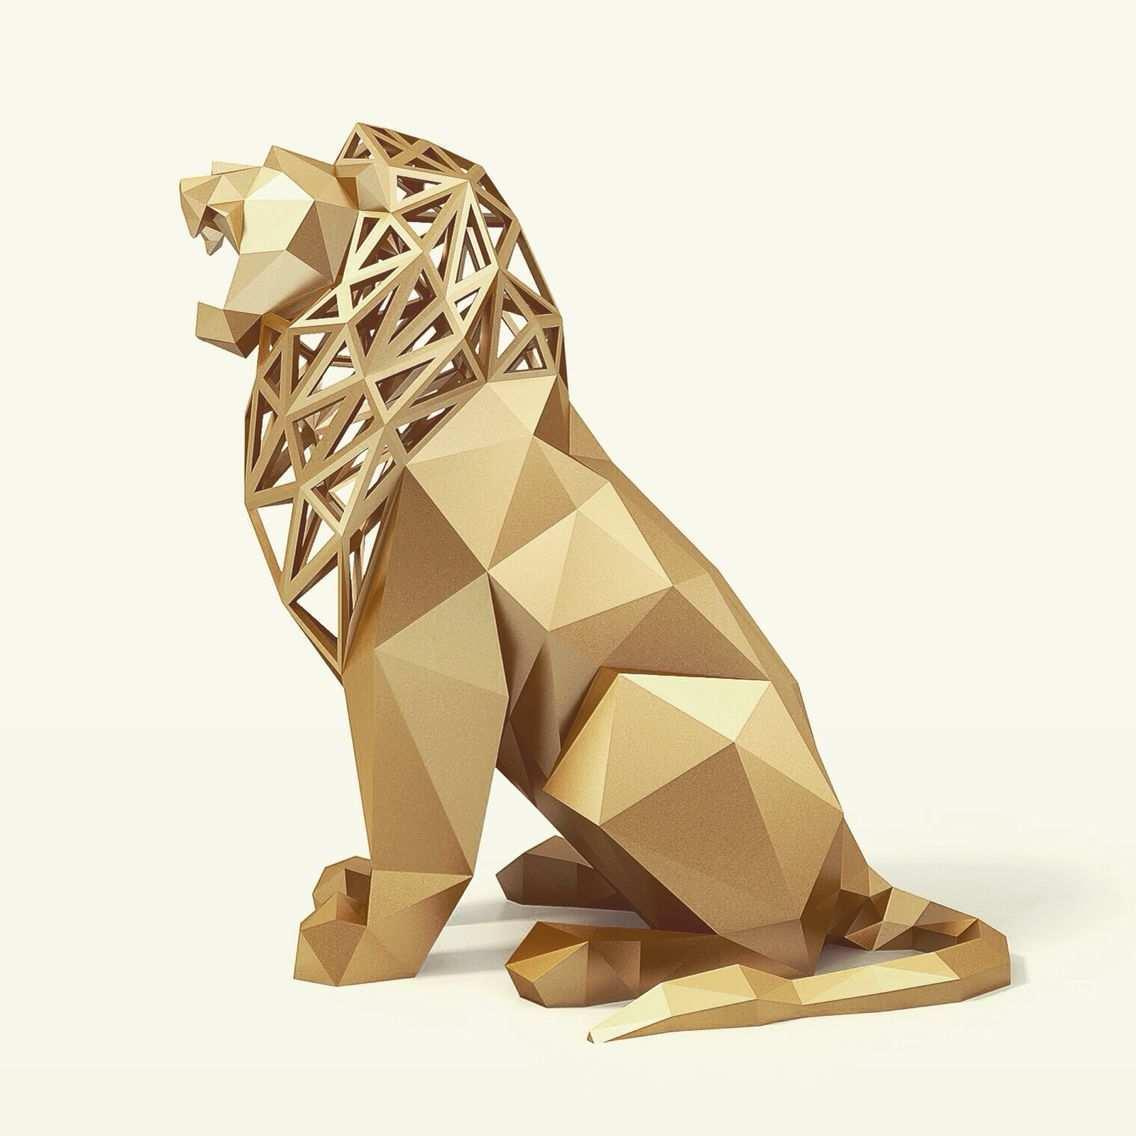 Roaring Lion By Formbyte On Shapeways 3d Printing Art Paper Sculpture Geometric Animals